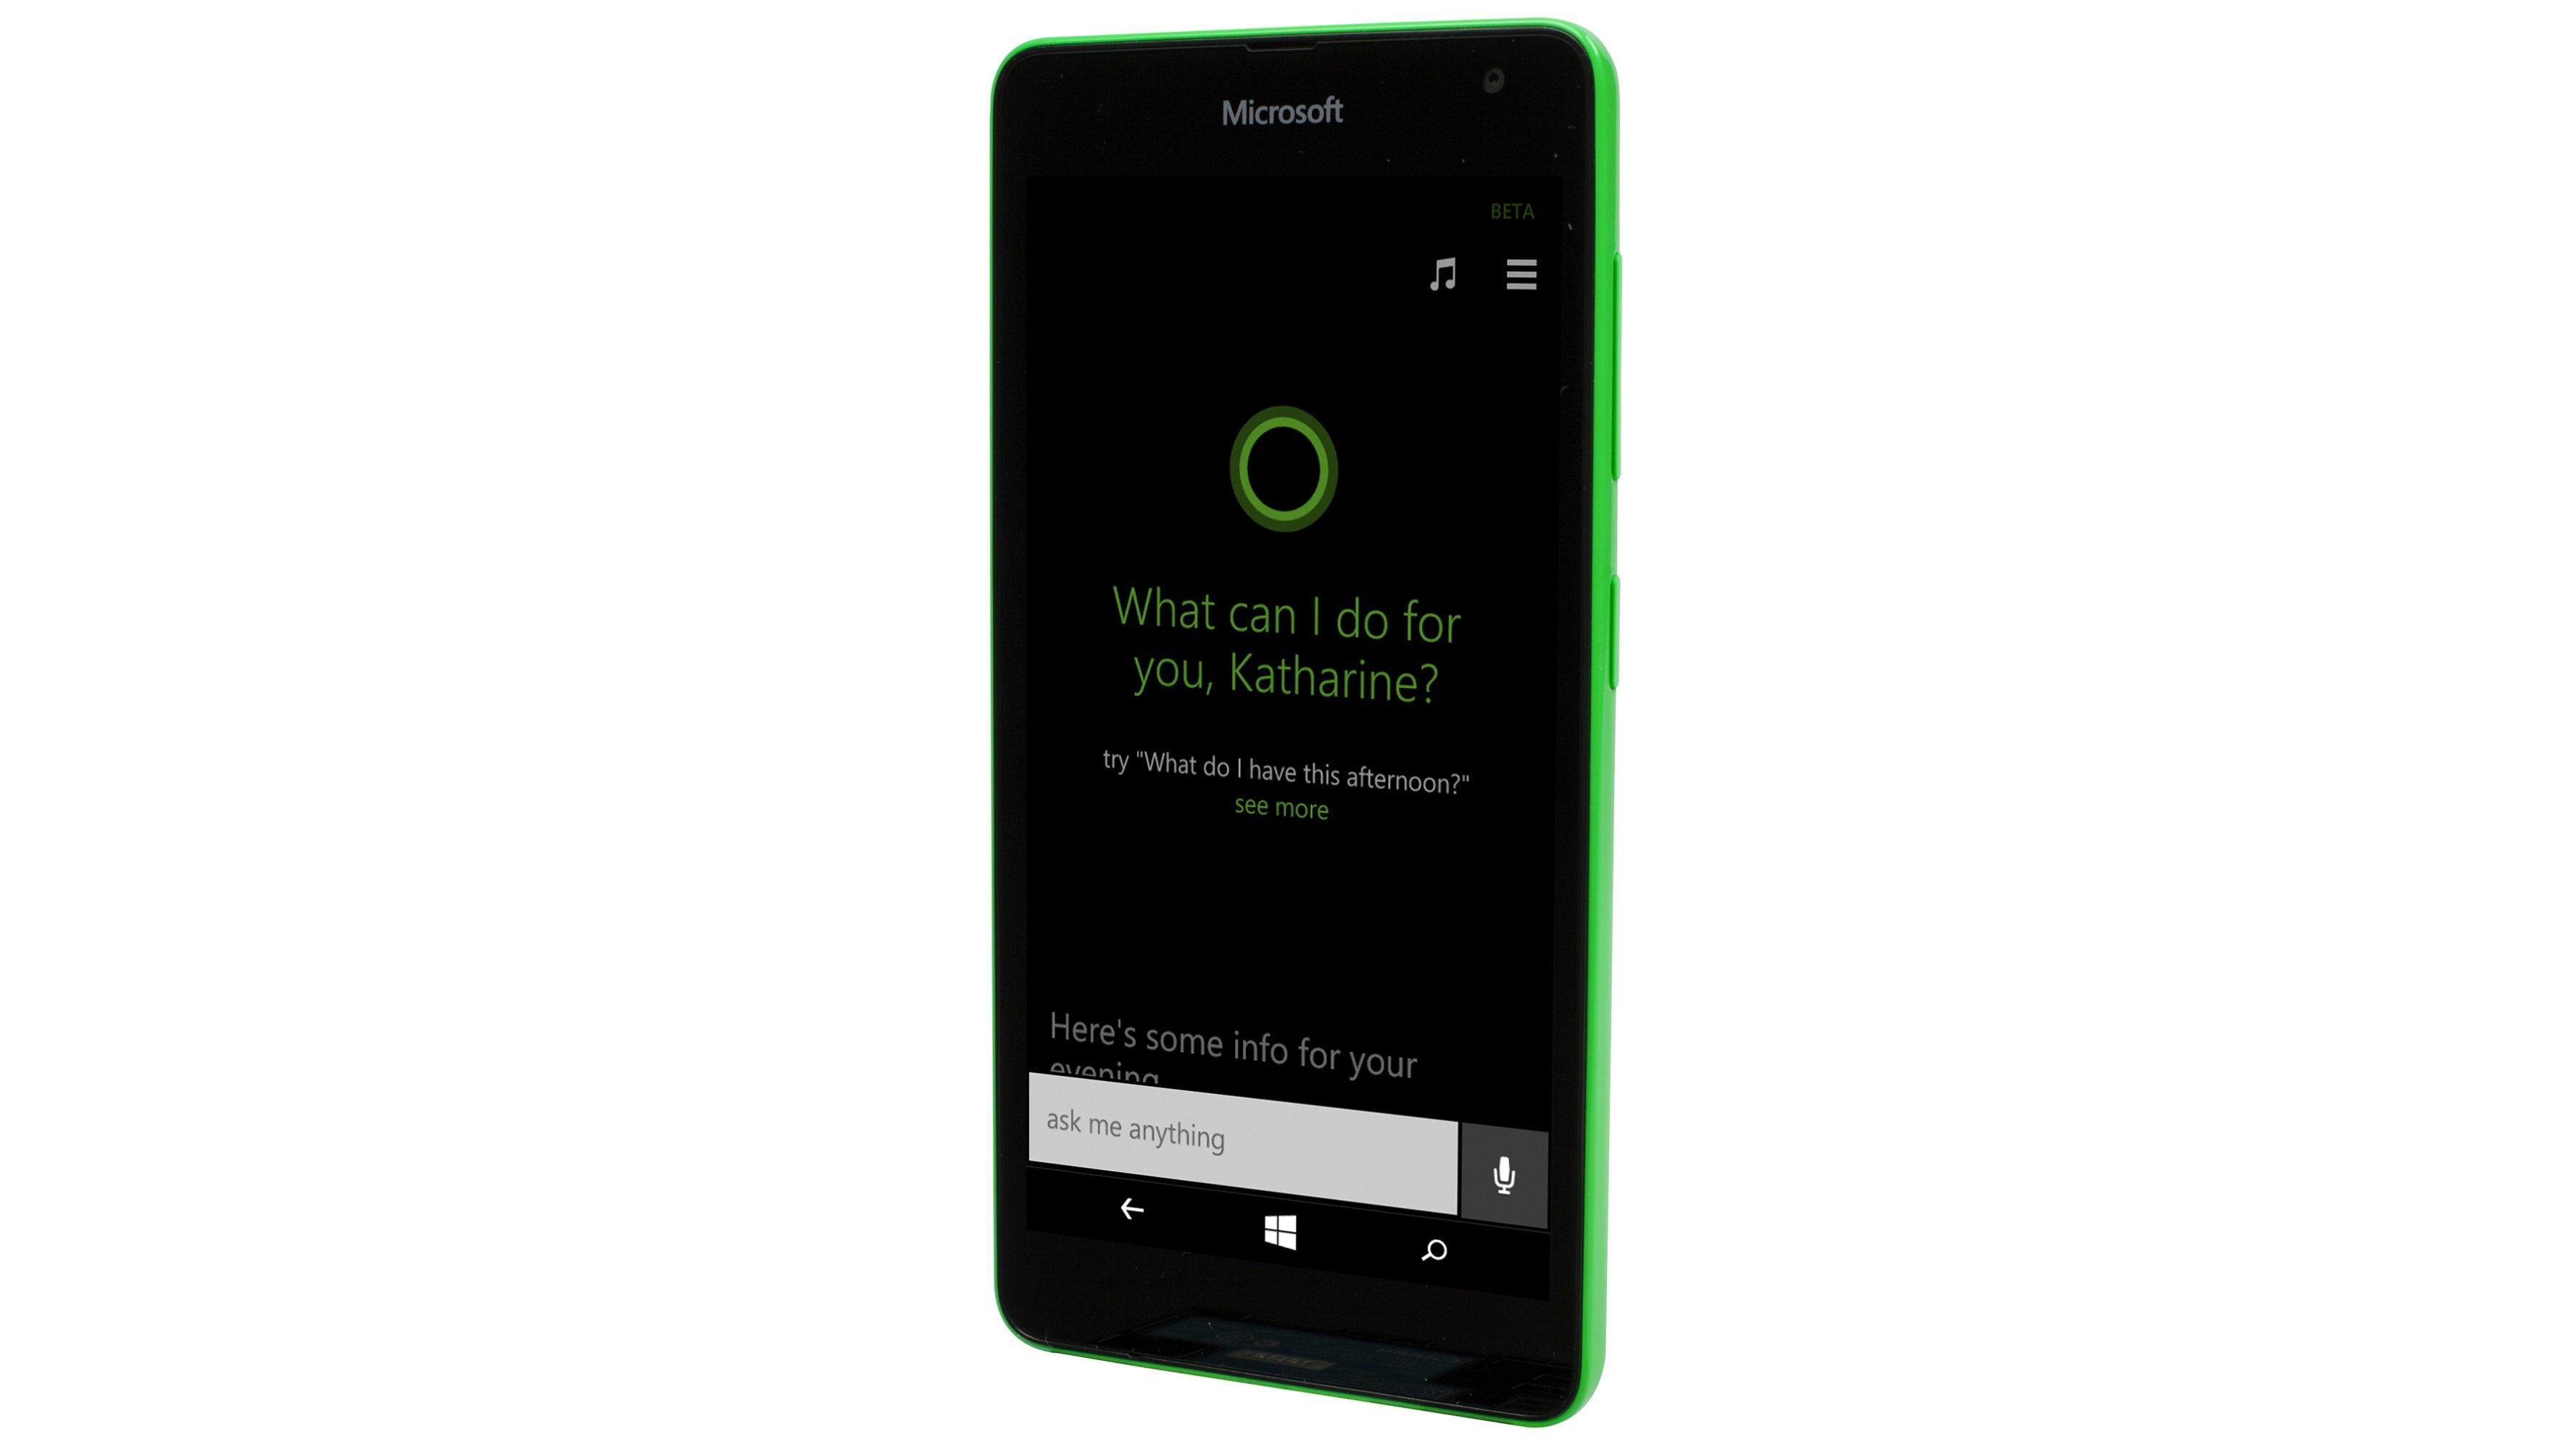 Microsoft lumia 535 dual sim white quad core 1 2ghz unlocked cell - Microsoft Lumia 535 Dual Sim White Quad Core 1 2ghz Unlocked Cell 19